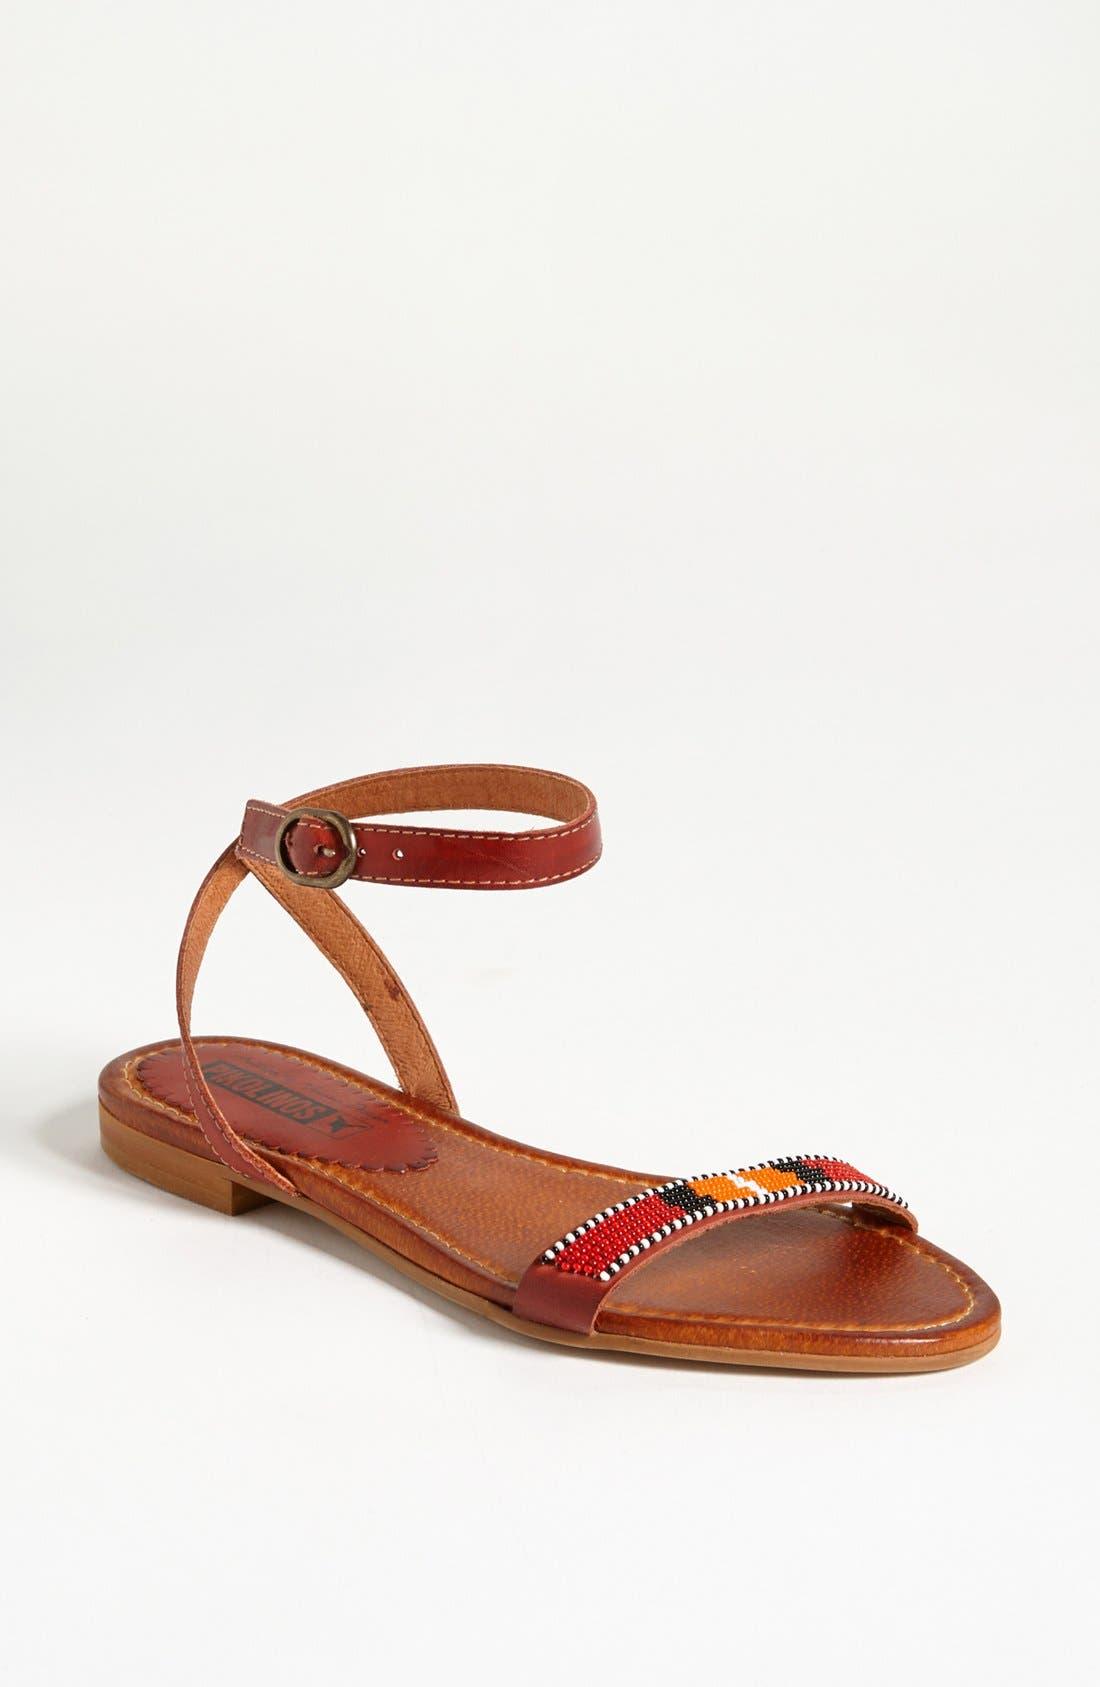 Alternate Image 1 Selected - PIKOLINOS 'Formentera' Sandal